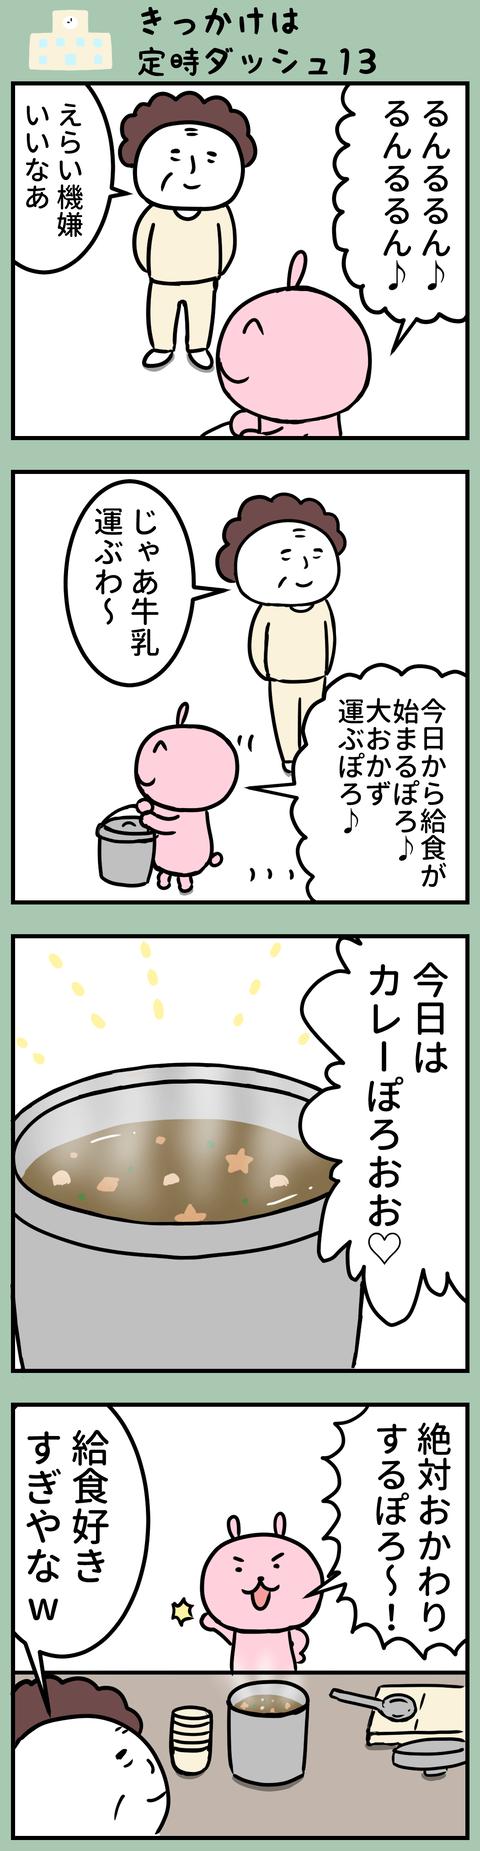 manga-yuzuporo66-1